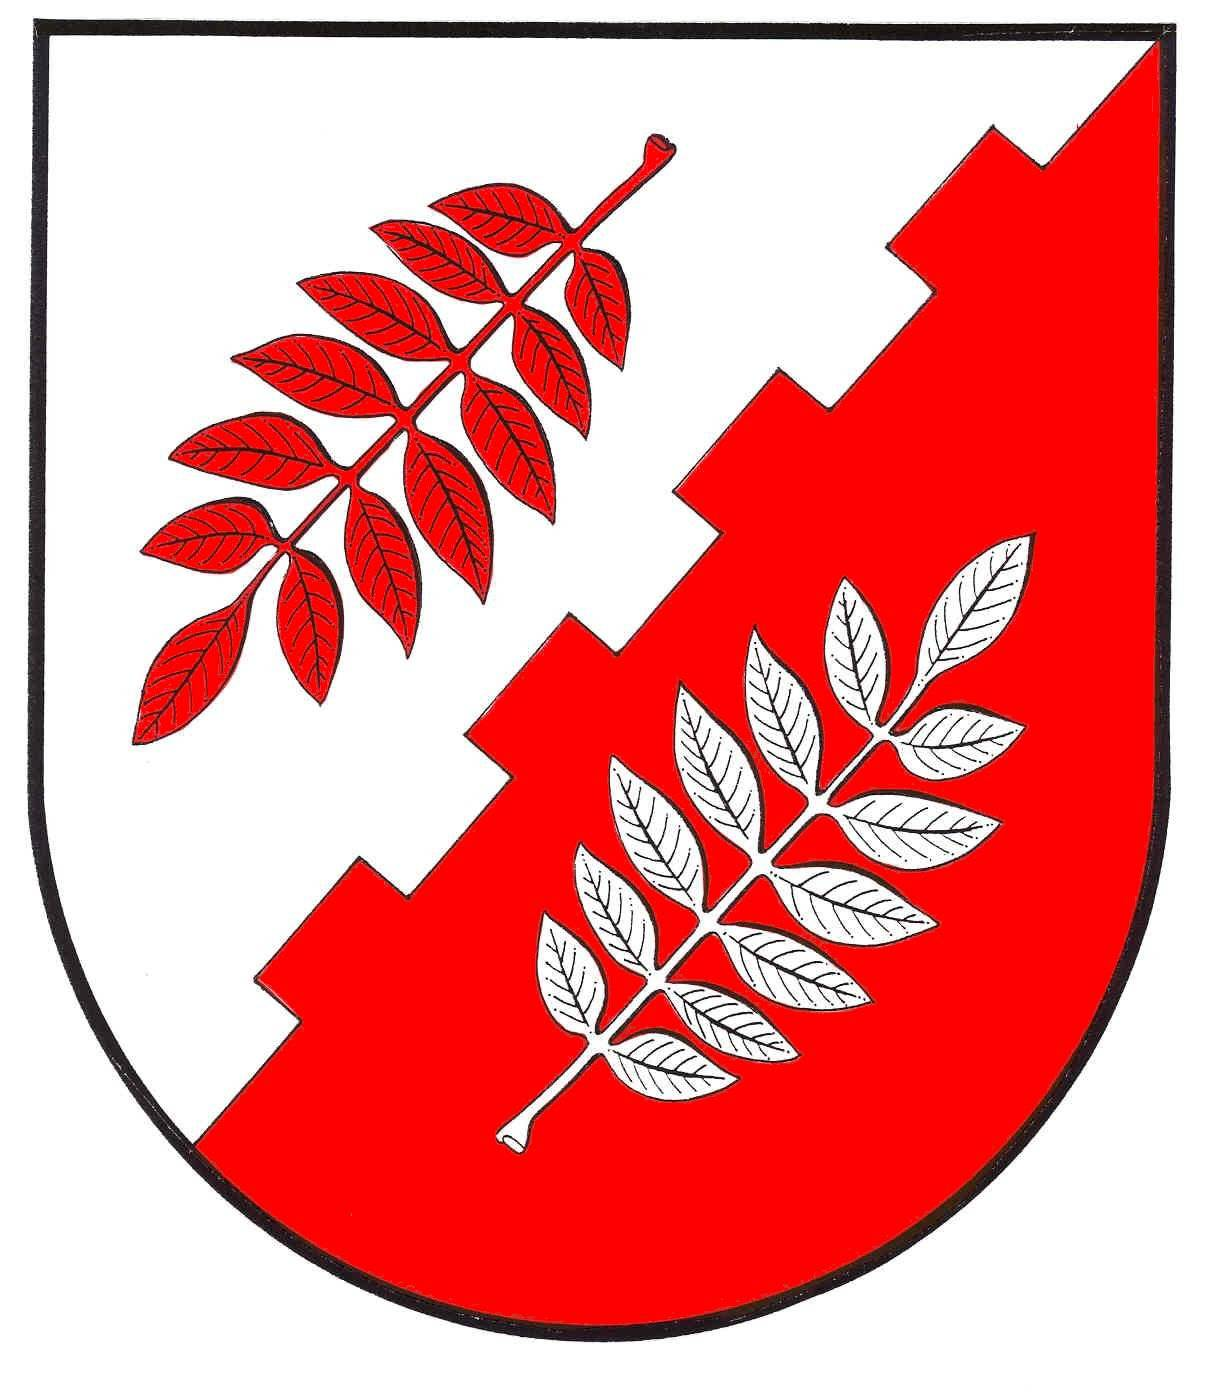 Wappen GemeindeAltenhof, Kreis Rendsburg-Eckernförde